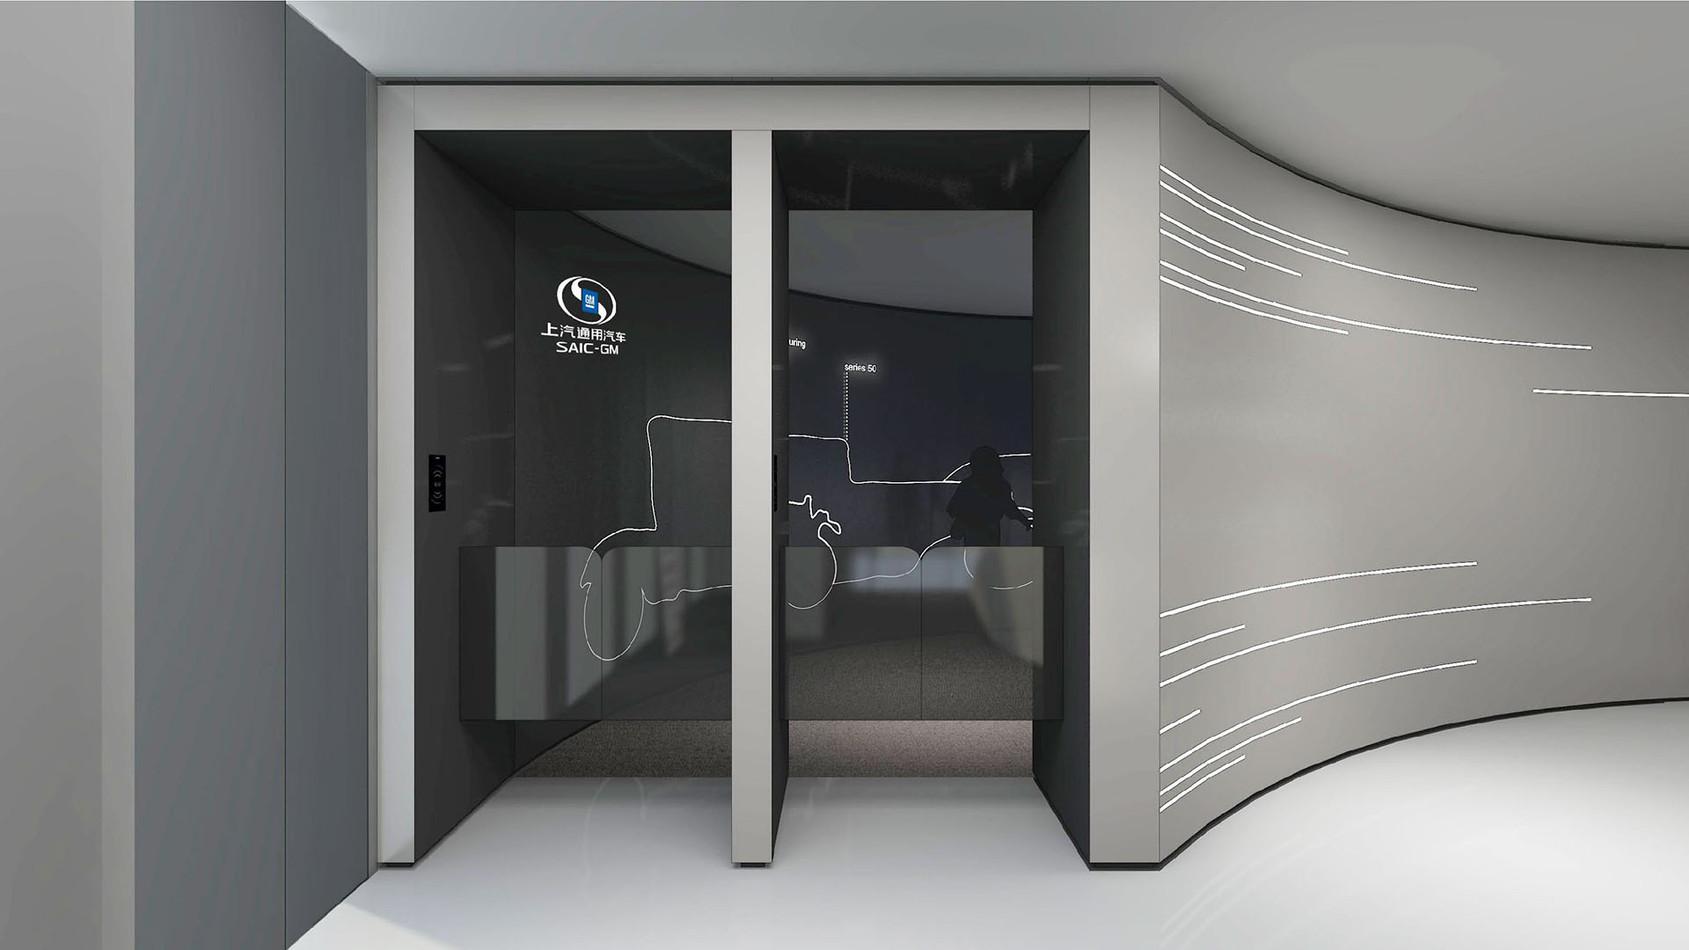 SGM-CORPORATE-MUSEUM-ZH 08.jpg